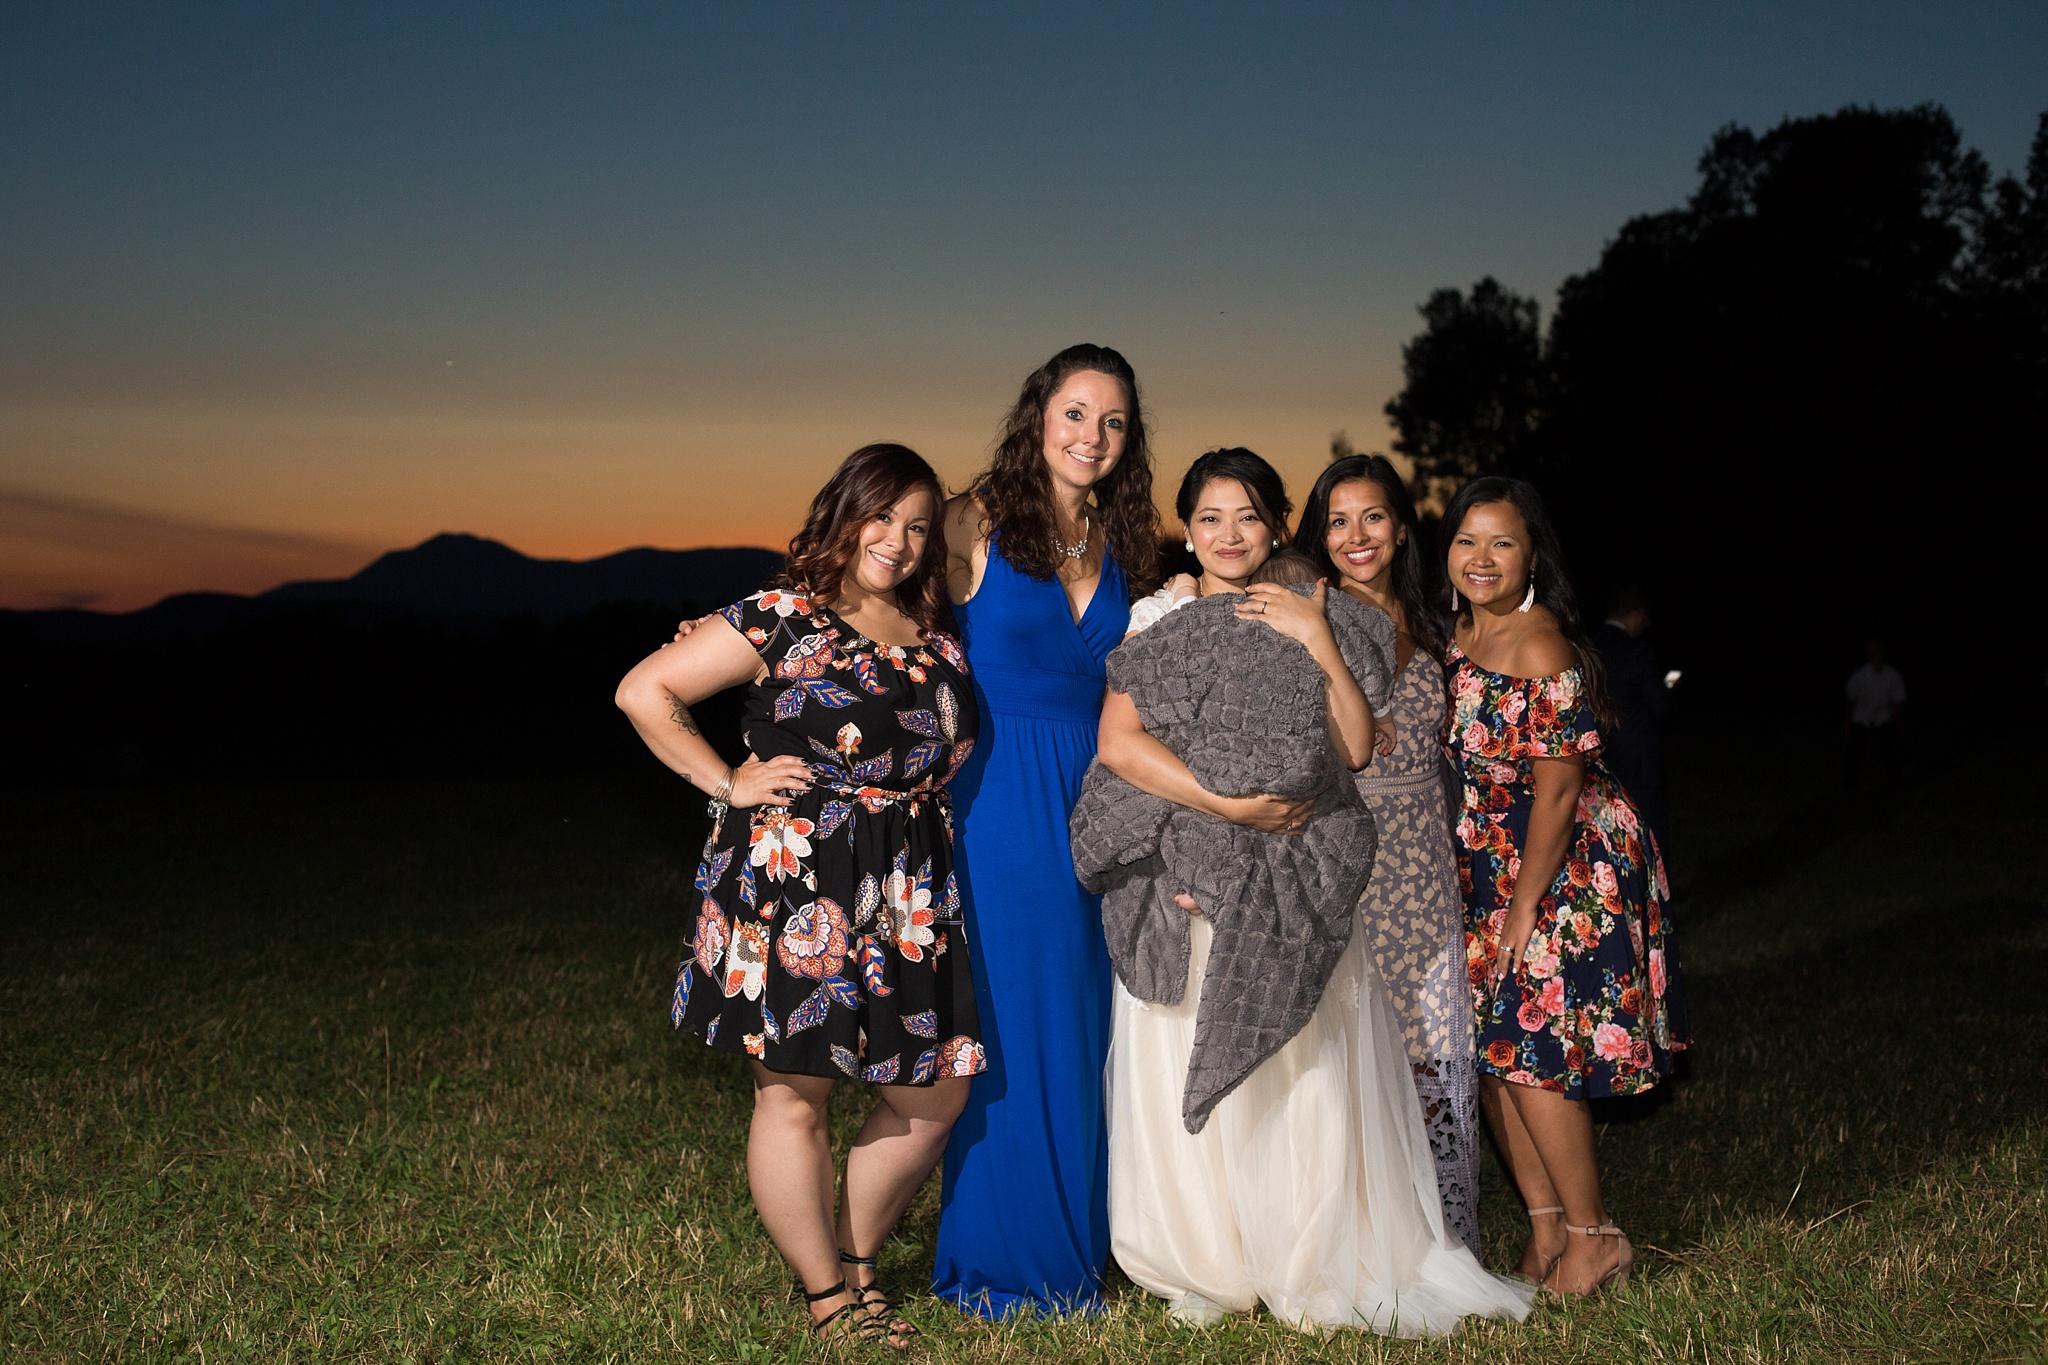 girlfriends at wedding